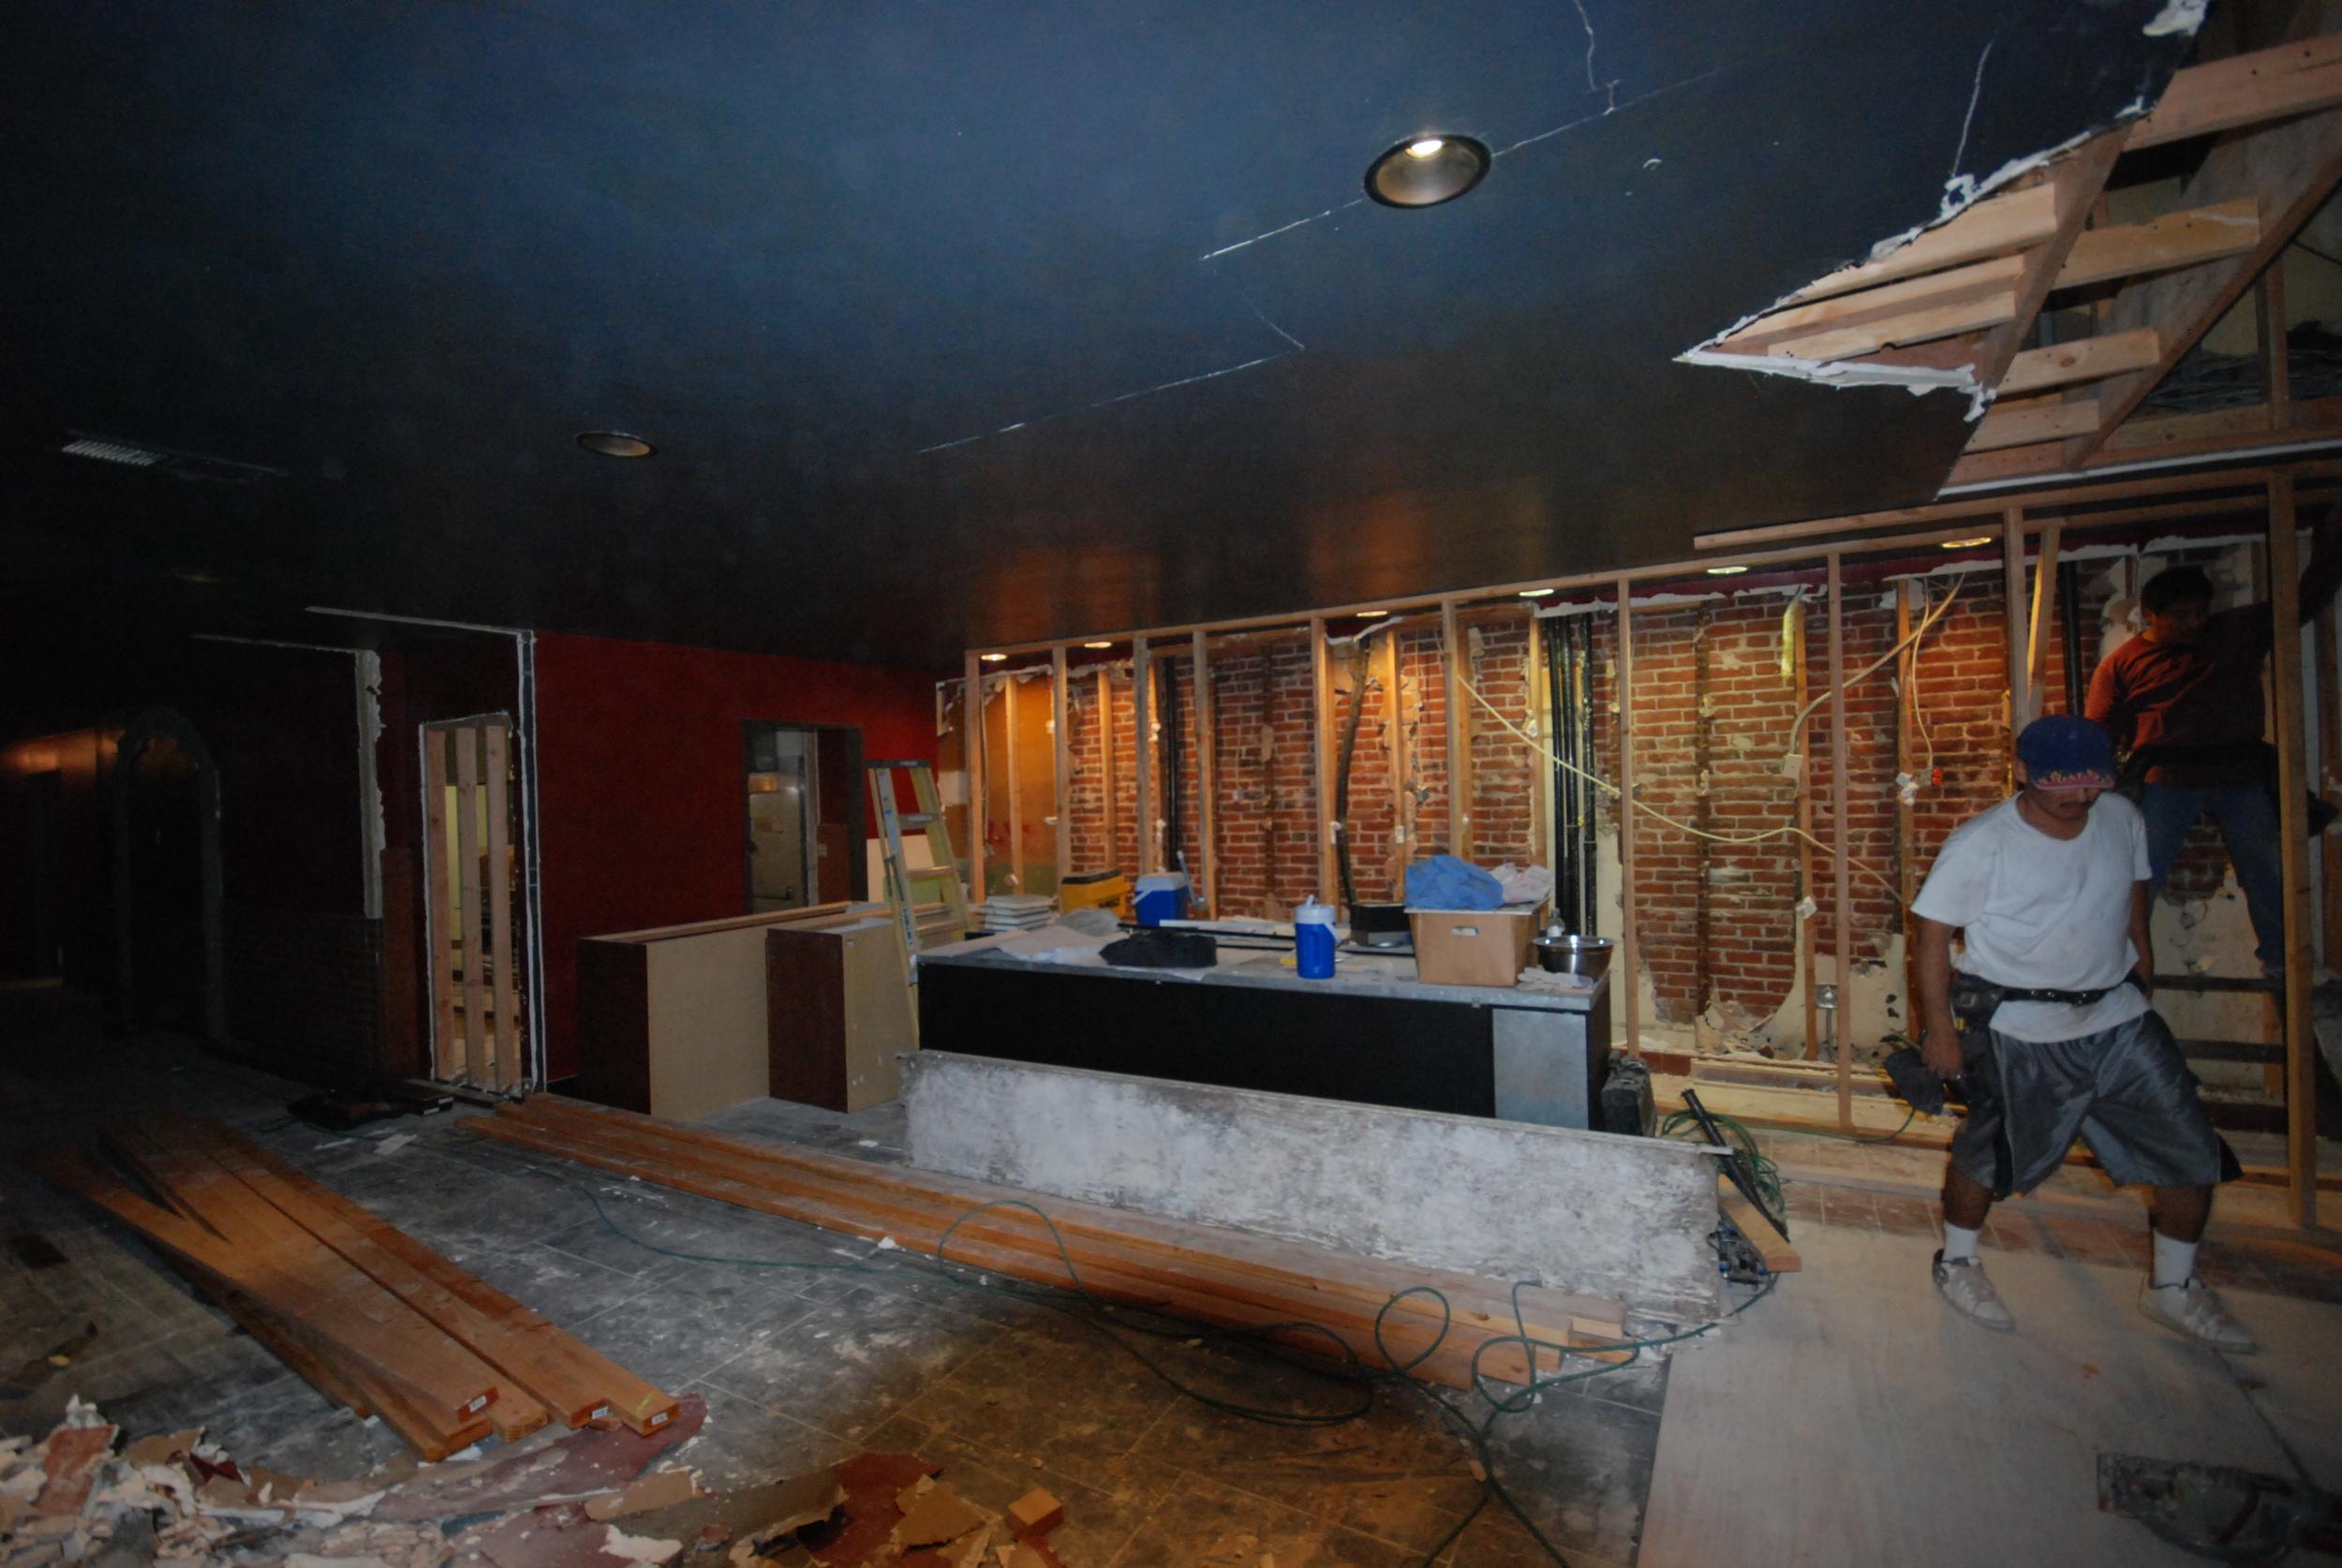 04_ san diego gaslamp cafe 212 demo point of departure studio.JPG